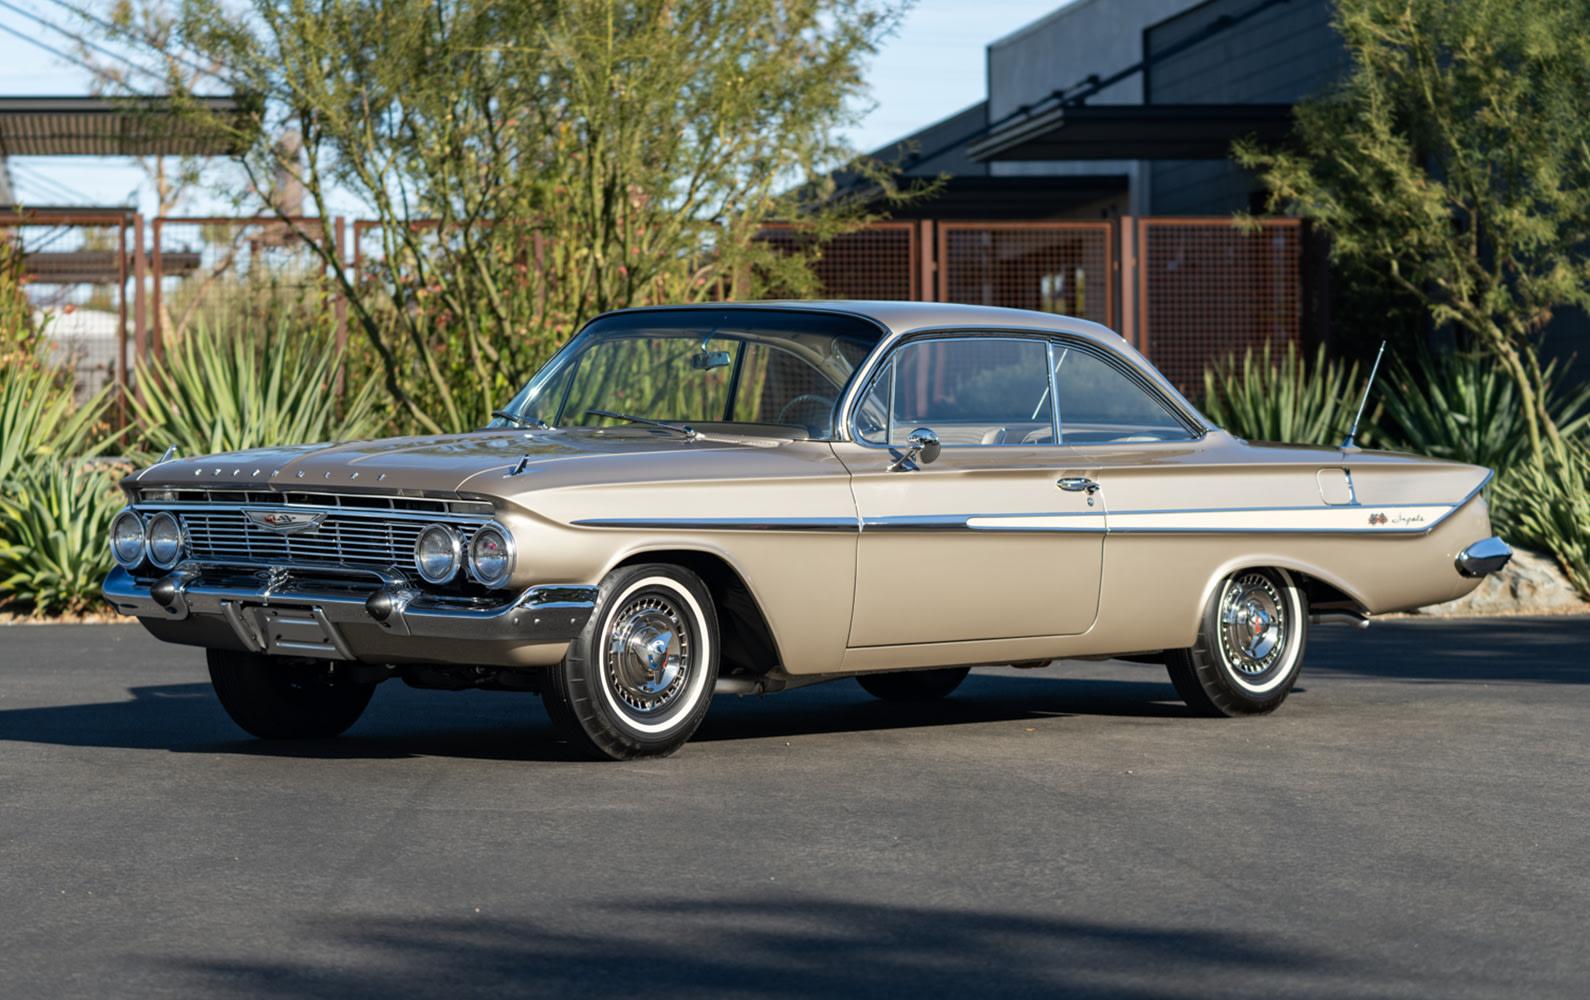 Prod/O21F - May 2021/1437_1961 Chevrolet Impala SS 409 360 Sport Coupe/1961_Chevrolet_Impala_SS_409_360_Sport_Coupe_1_ik2d2n